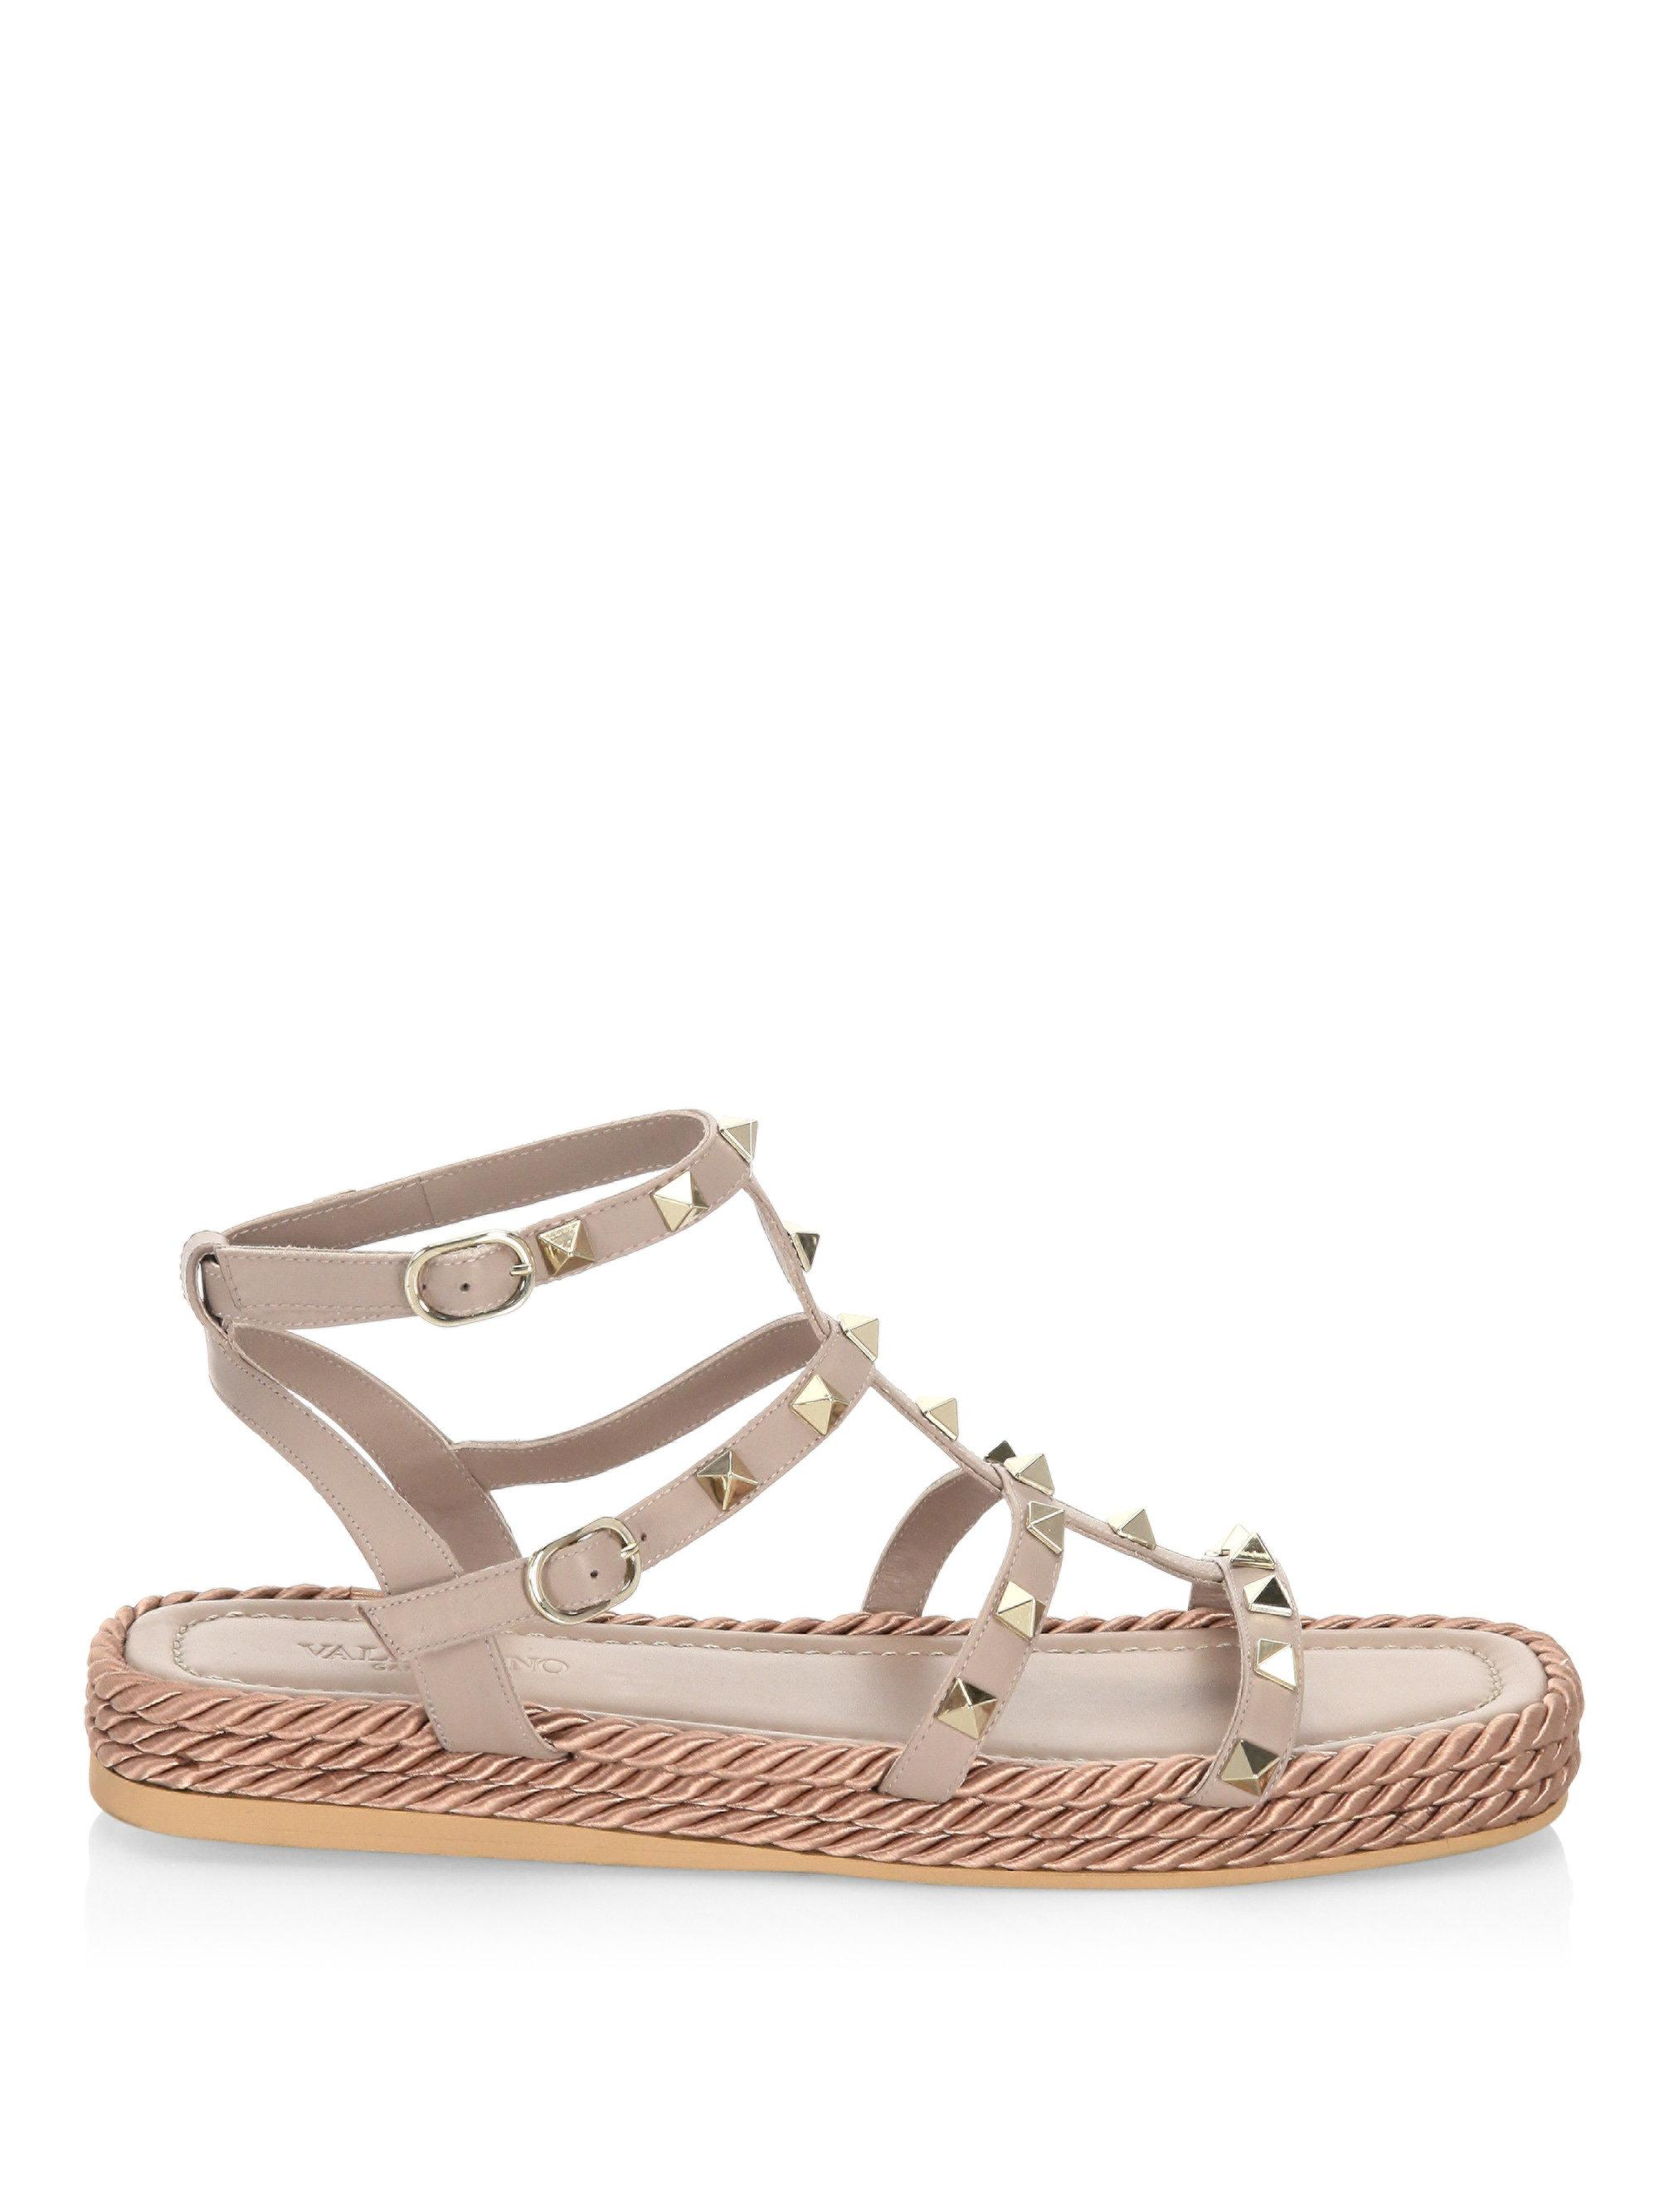 Valentino Women's Torchon Strappy Sandal 3GOzuR0zl